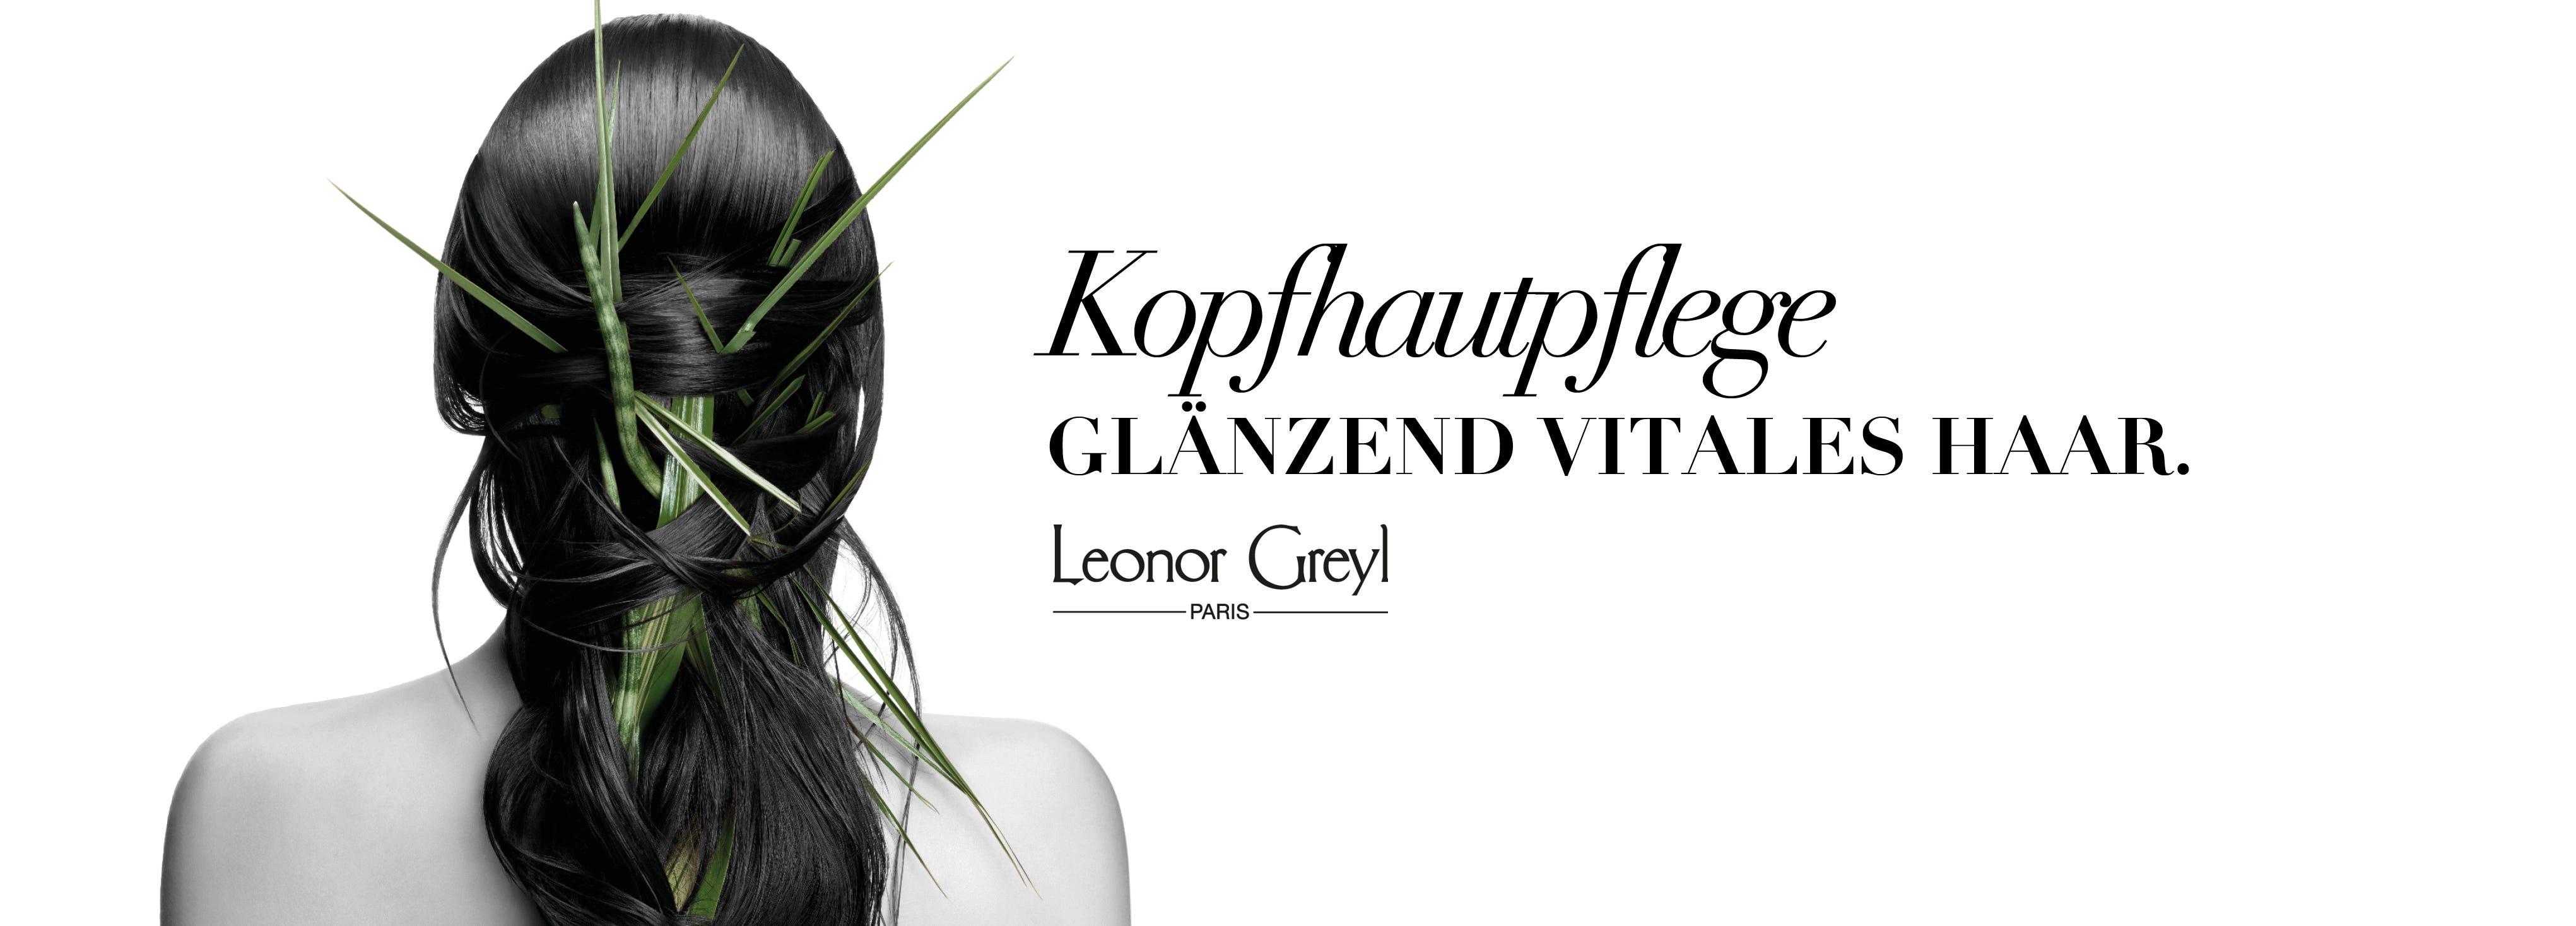 Leonor Greyl Kopfhautpflege